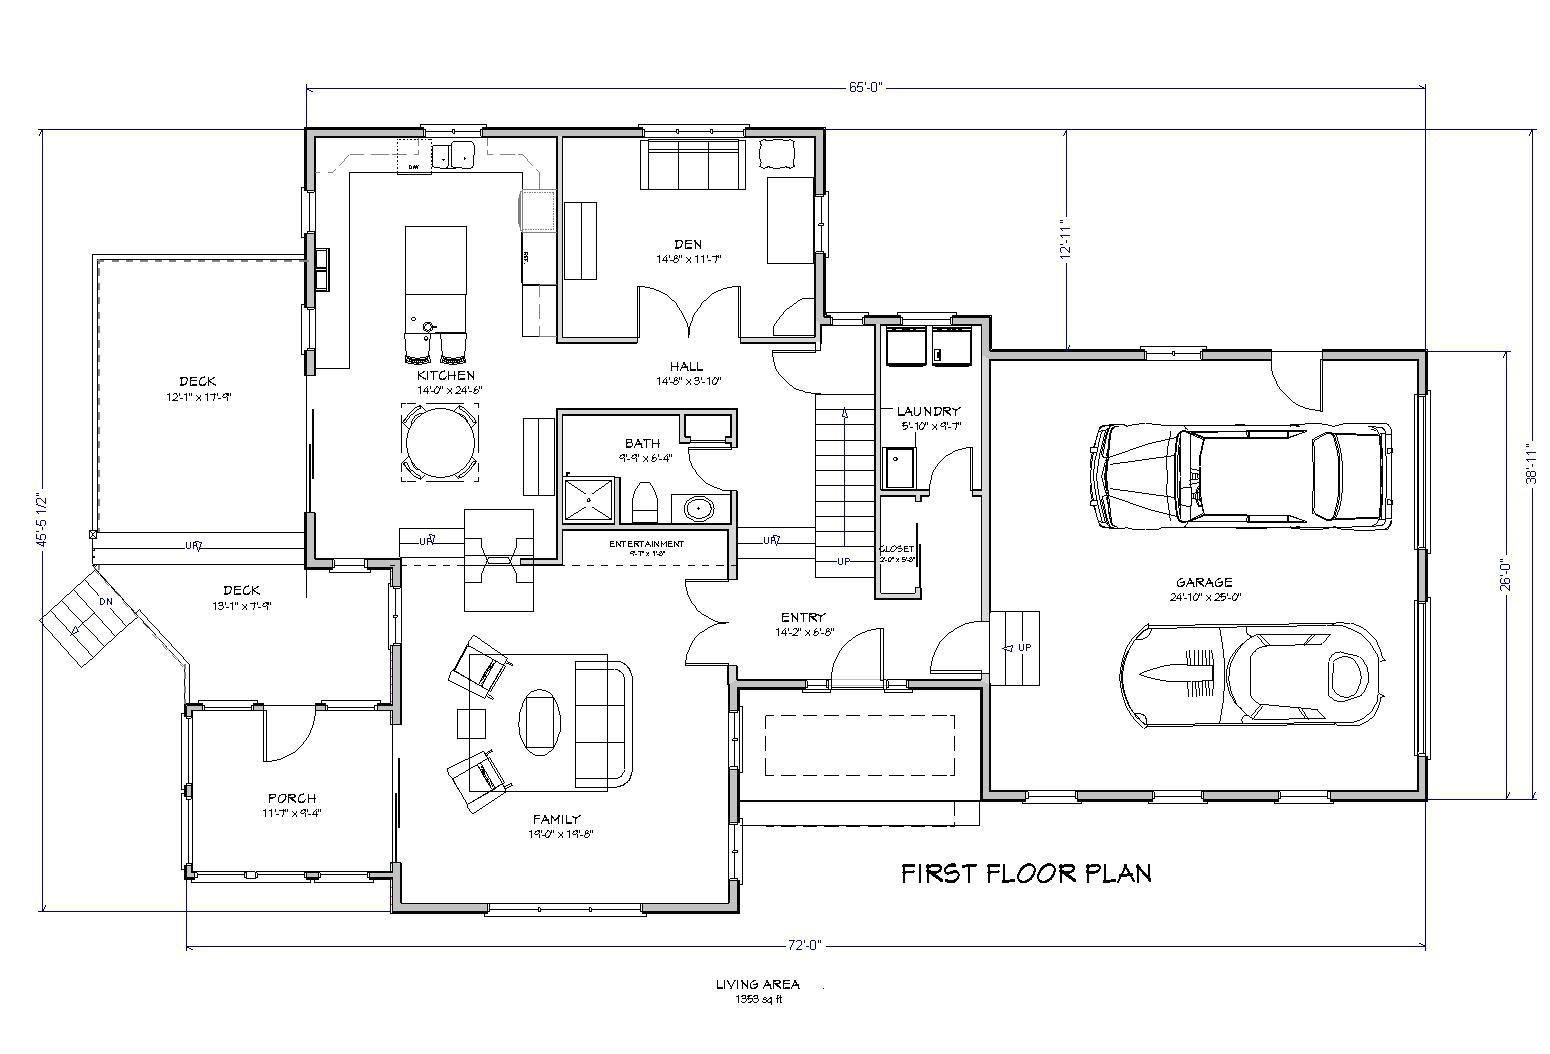 2500 sqft 4 bedroom house plans